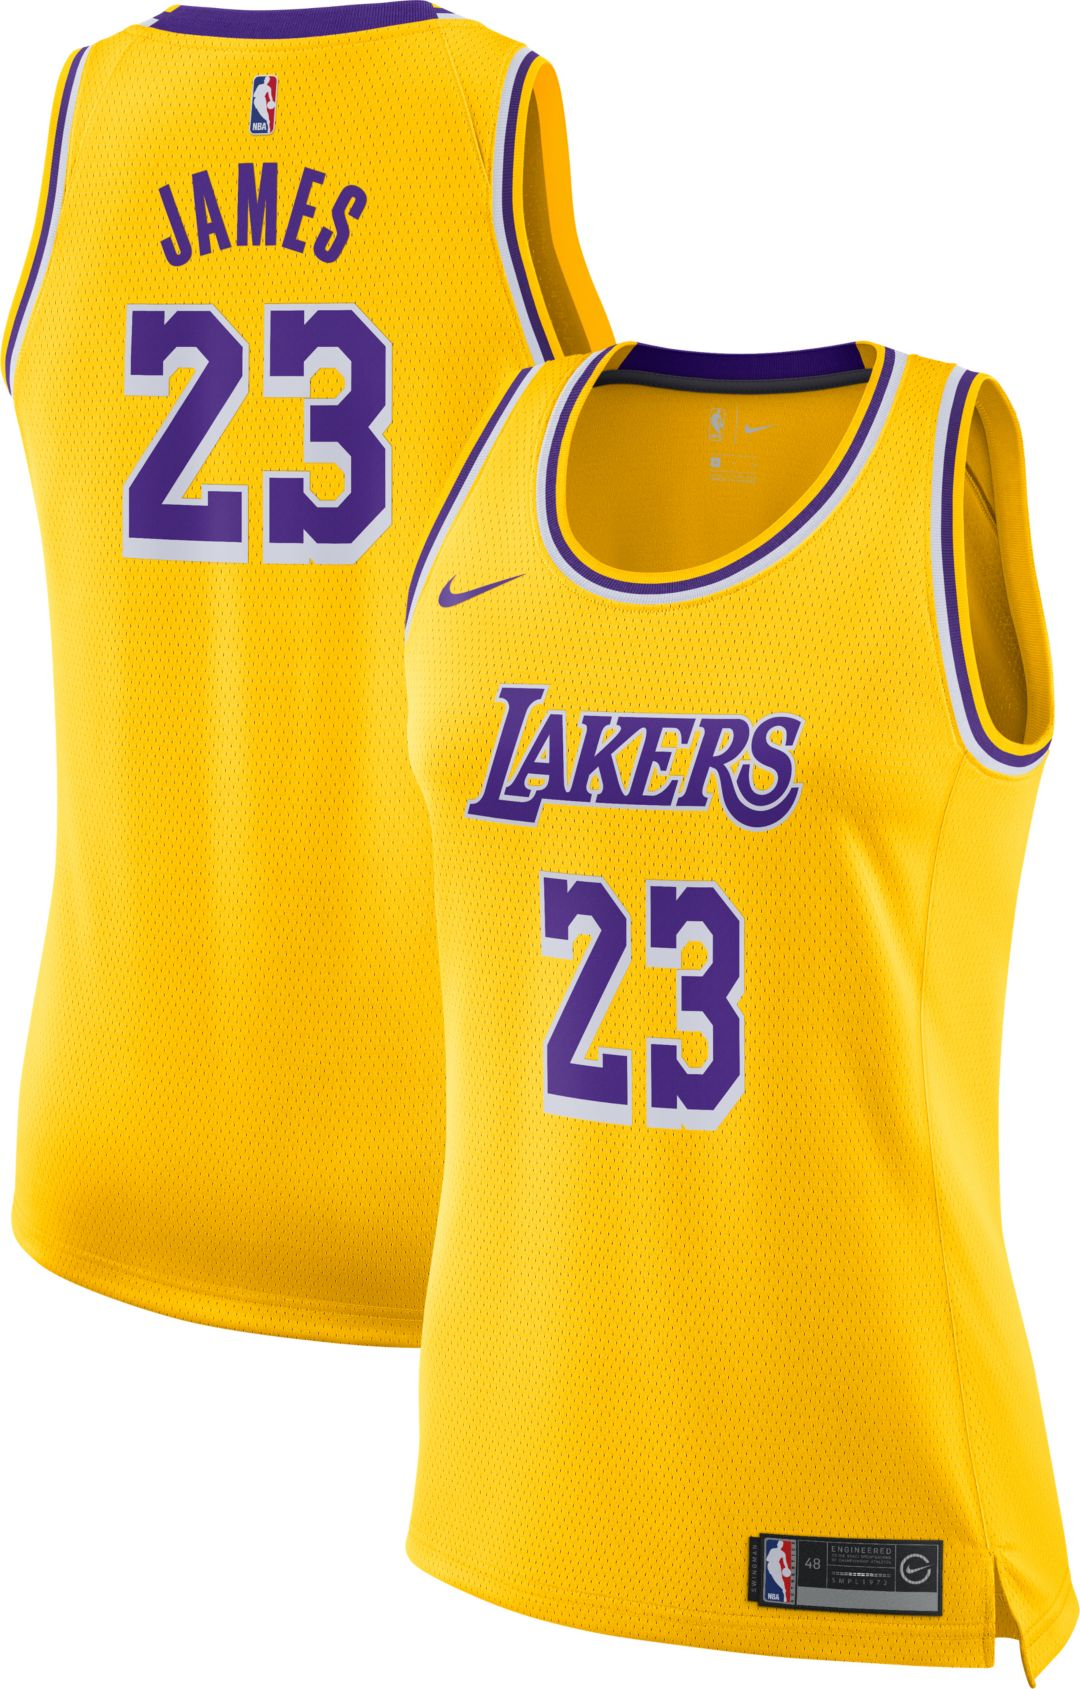 sale retailer 451cd 8ad28 Nike Women's Los Angeles Lakers LeBron James #23 Gold Dri-FIT Swingman  Jersey